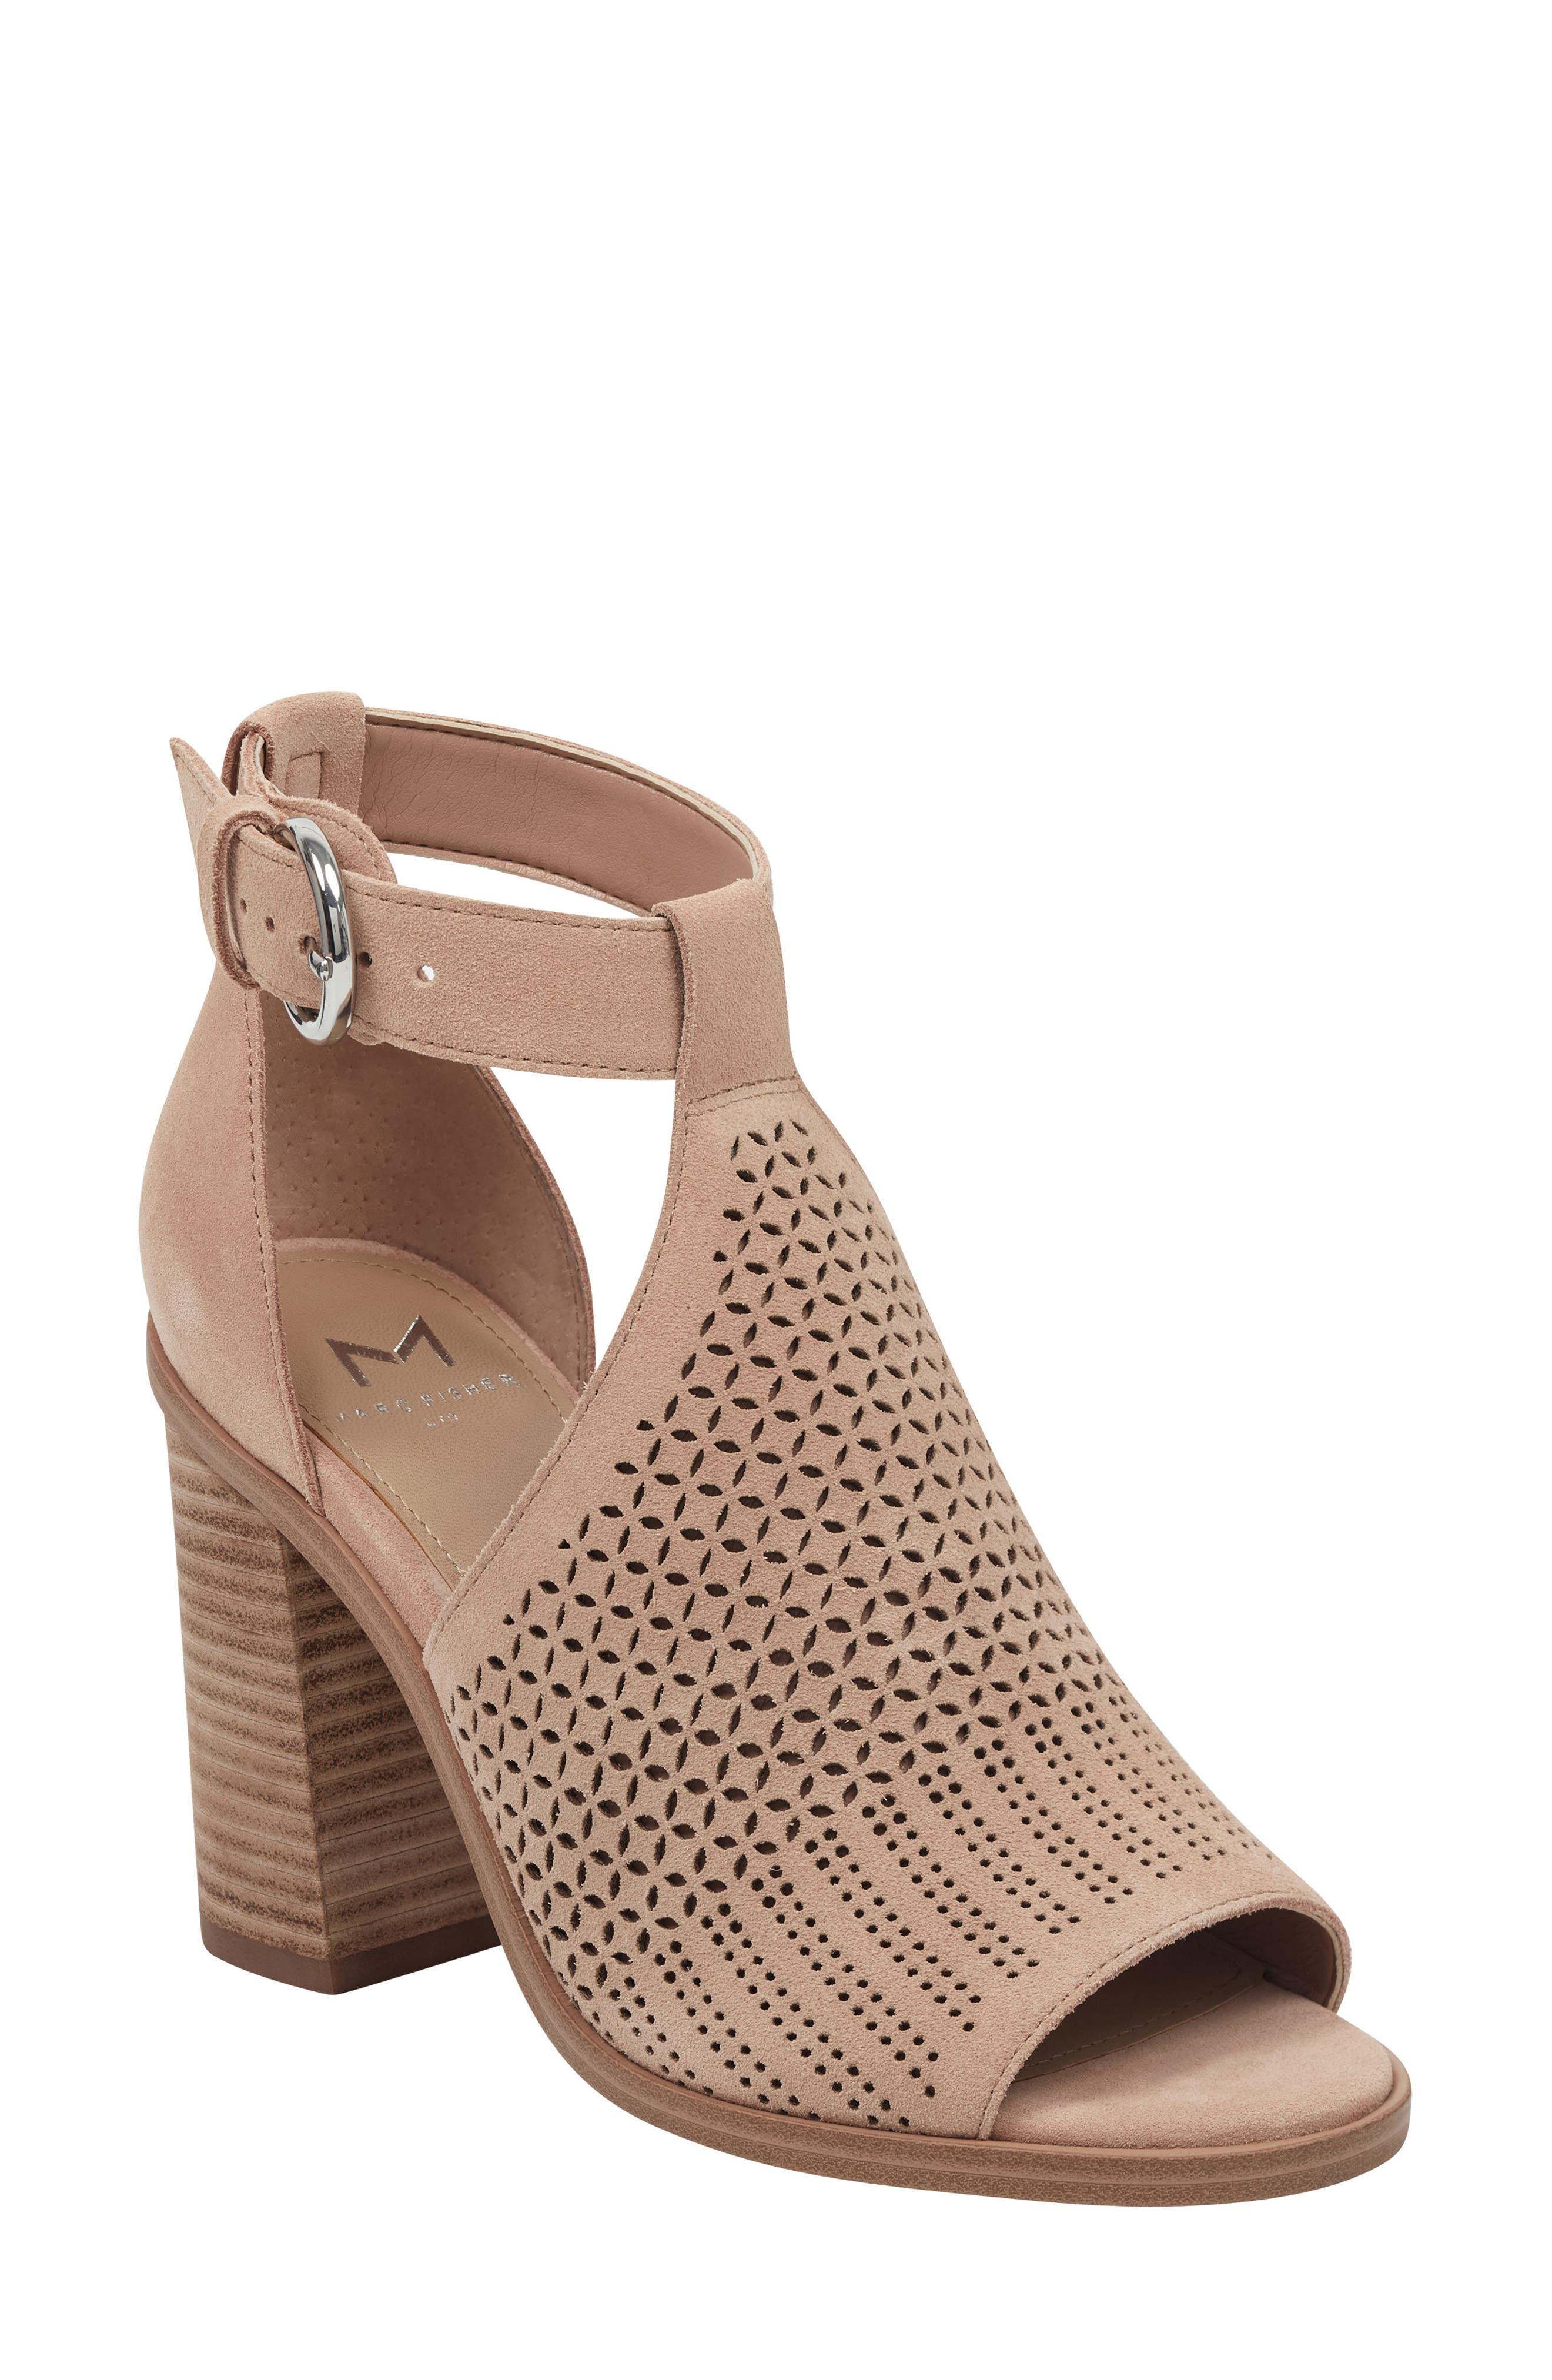 Marc Fisher Ltd Vixen Sandal- Beige